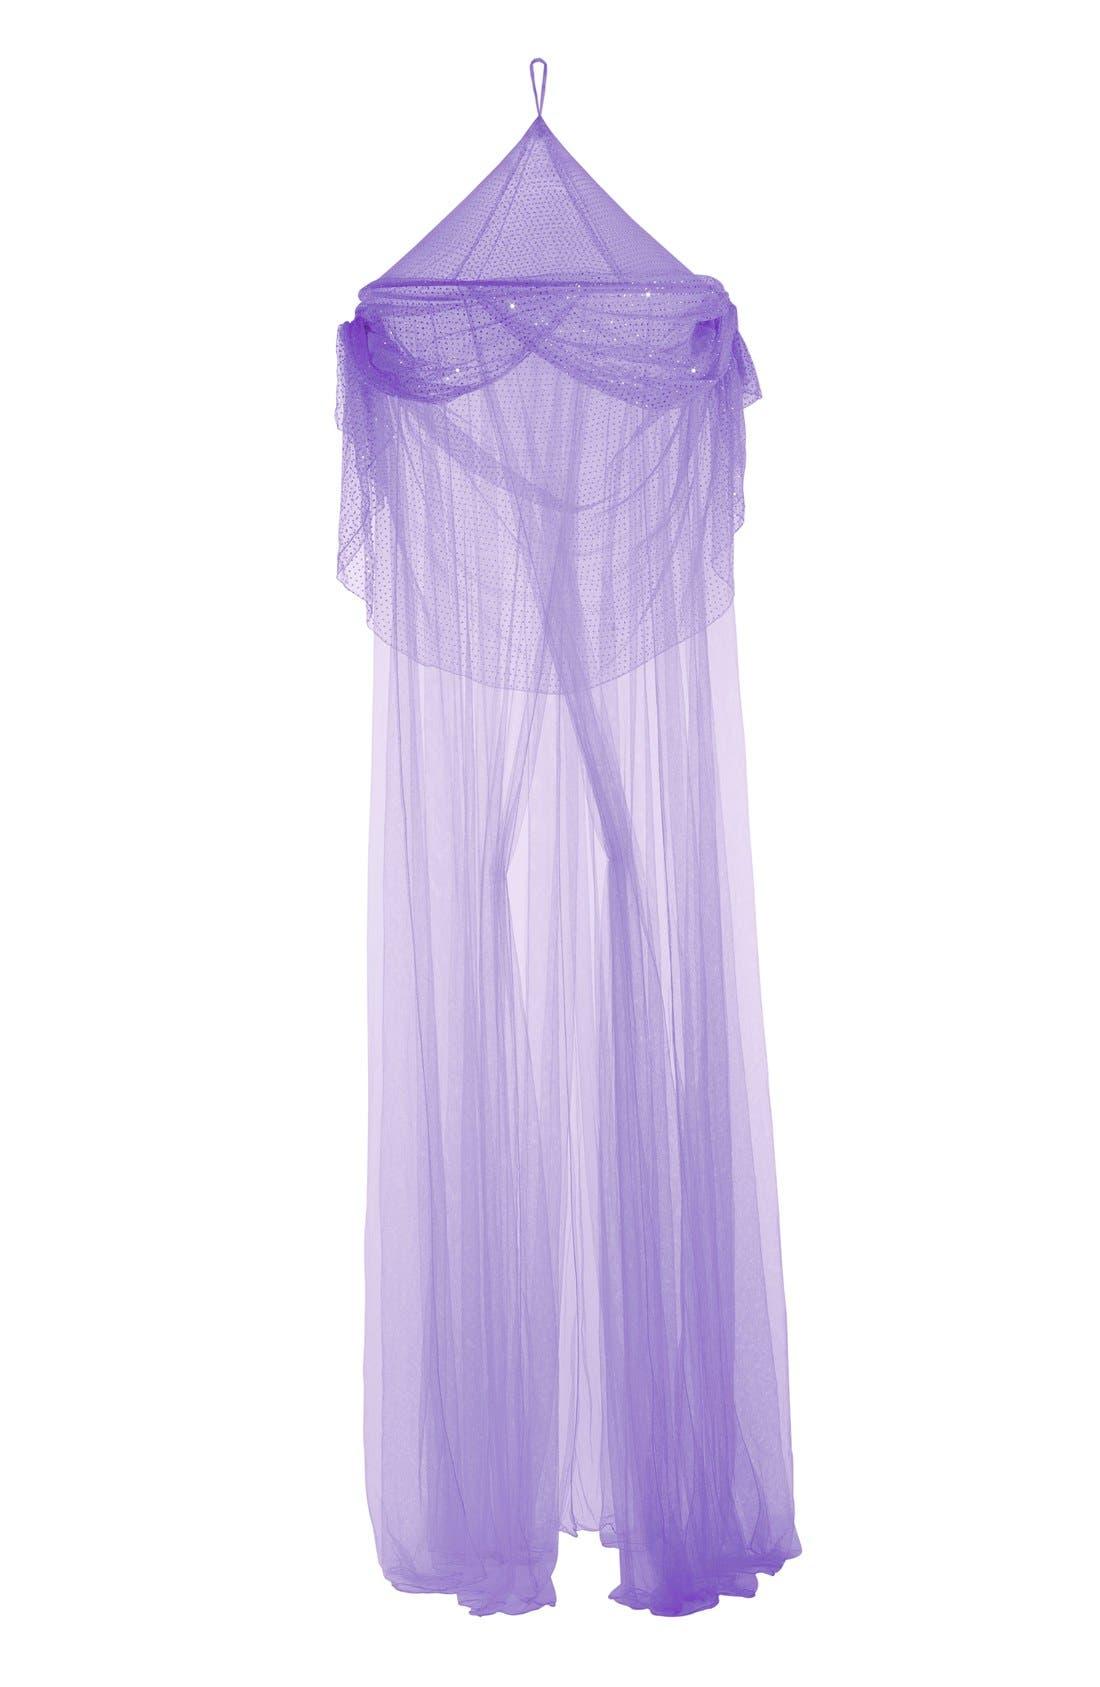 Alternate Image 1 Selected - 3C4G 'Purple SparkleTastic' Bed Canopy